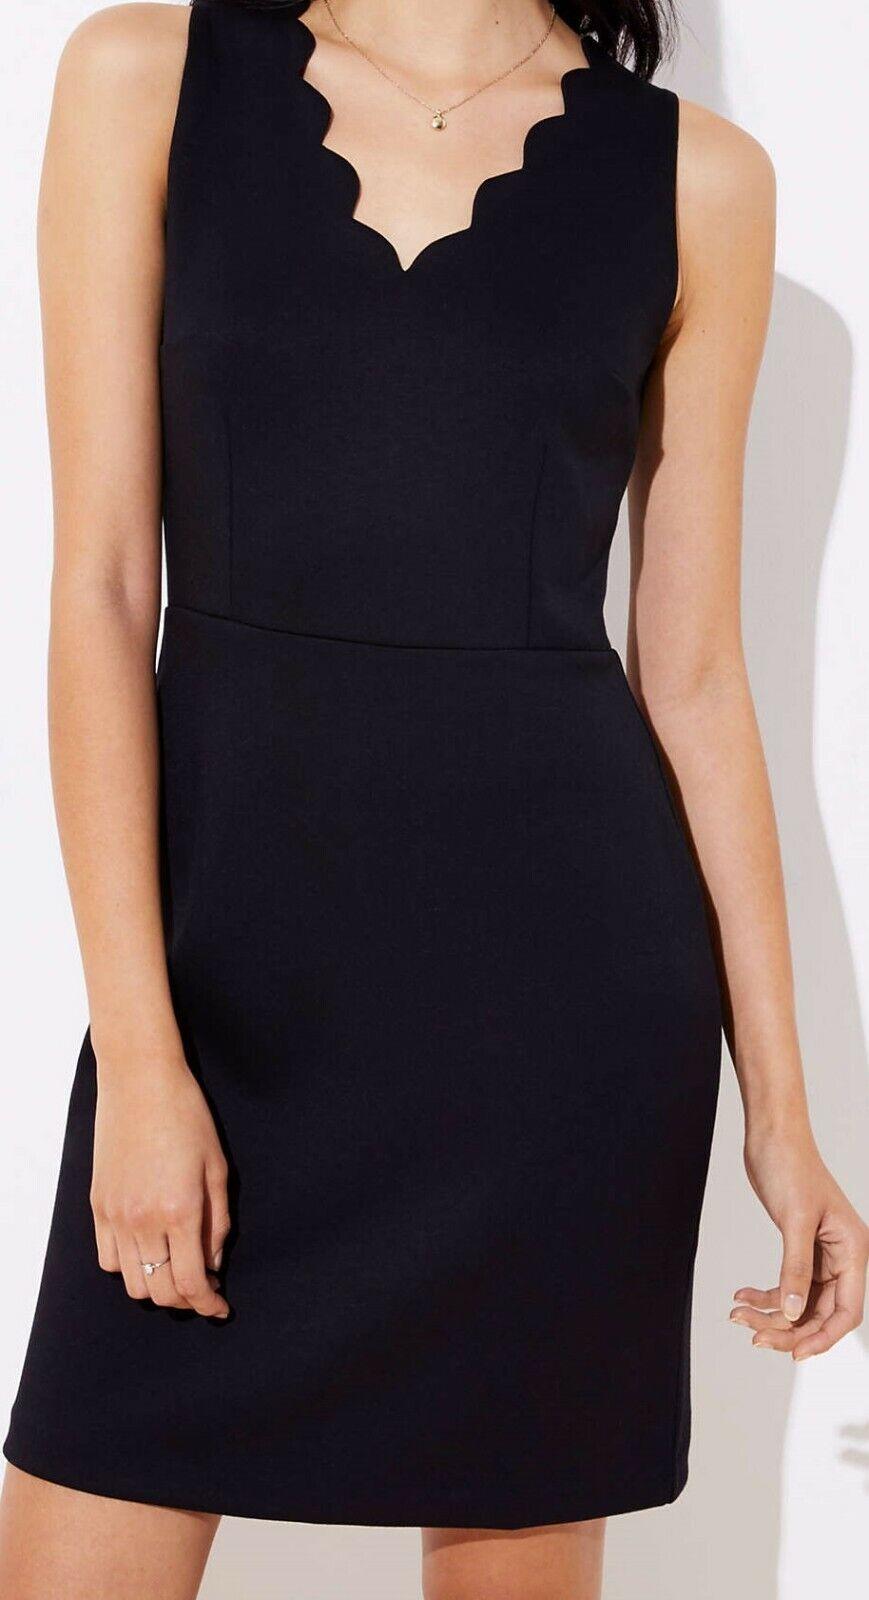 Ann Taylor LOFT Scalloped Sheath Dress Größe 00 Petite NWT schwarz Farbe